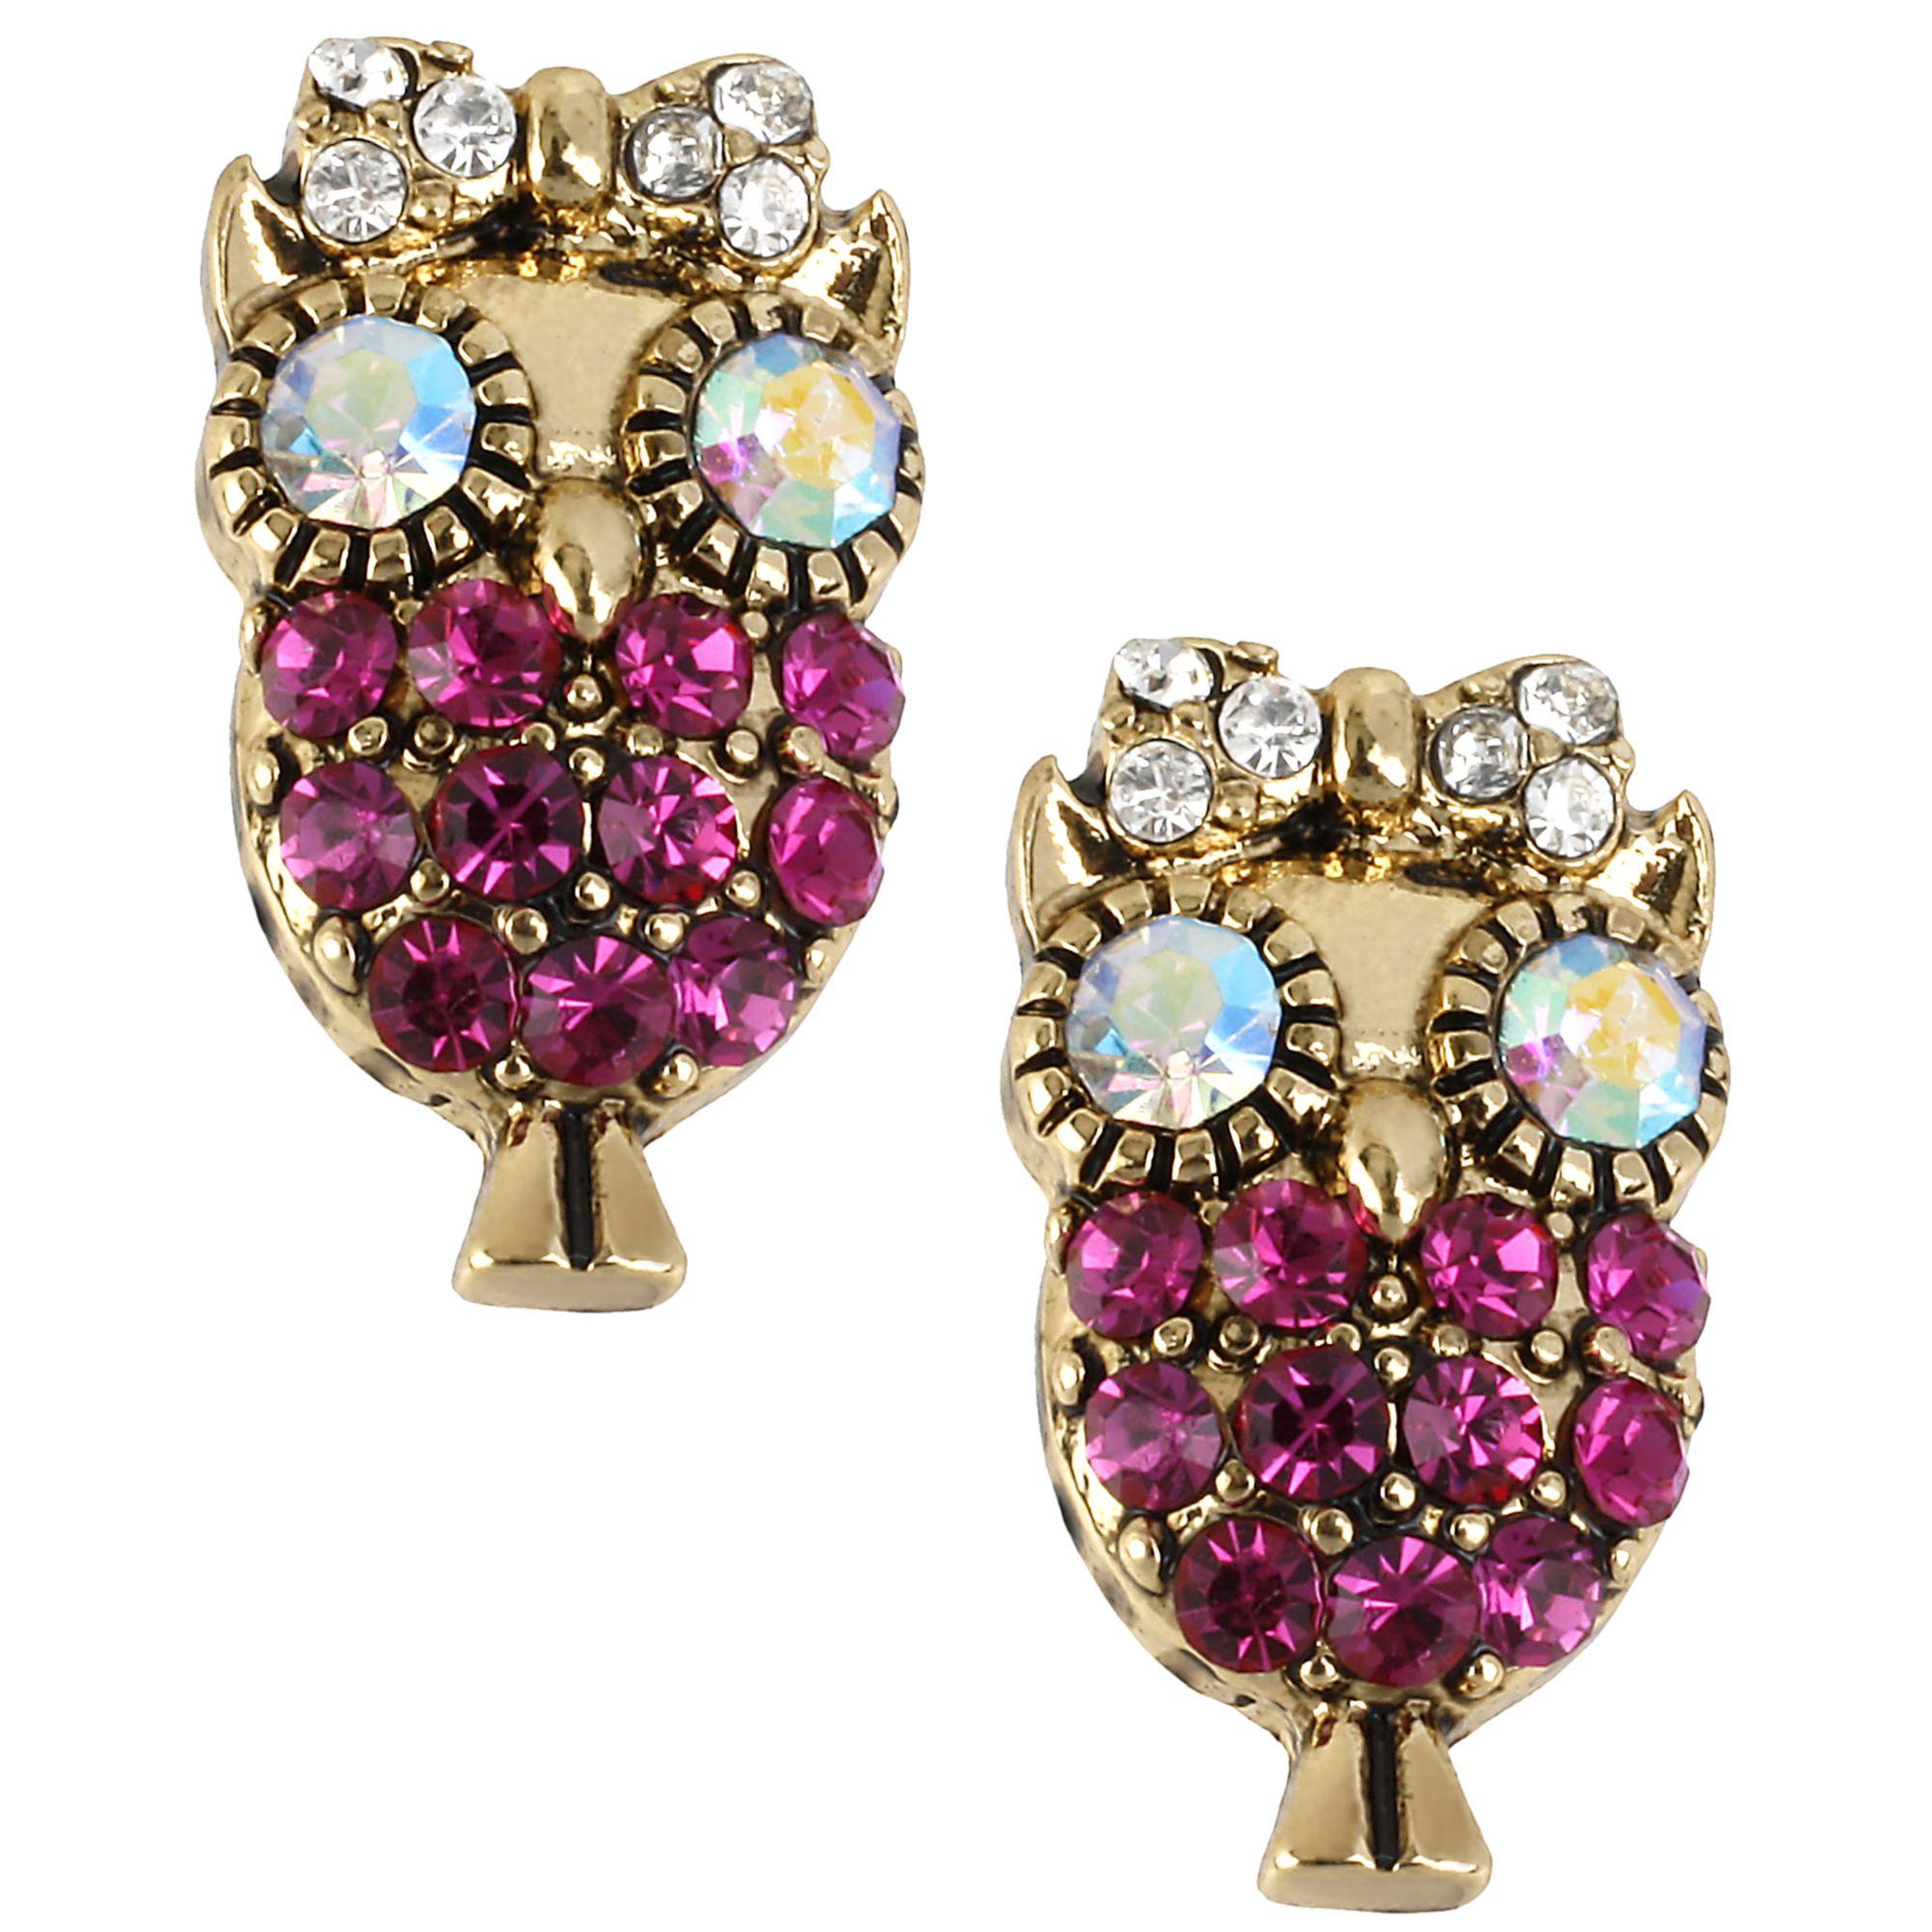 5f59c44c49147 Lyst - Betsey Johnson Antique Gold-tone Owl Stud Earrings in Metallic